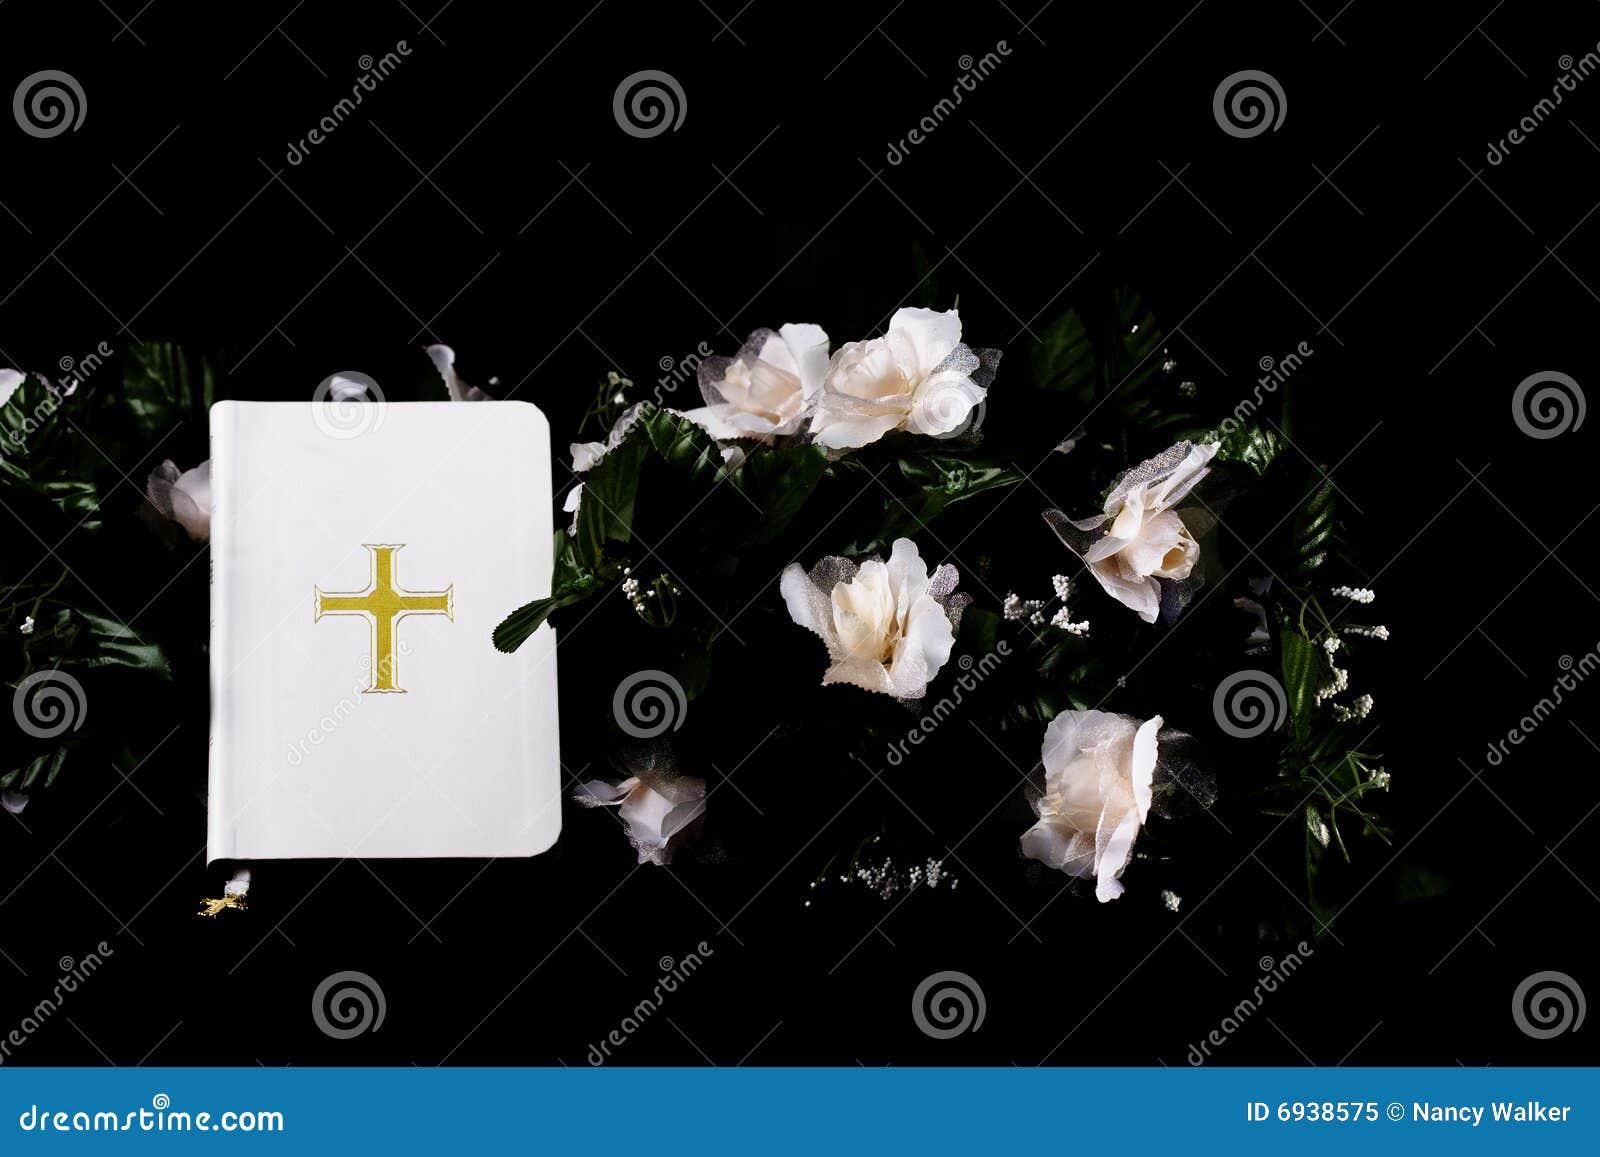 White Bible on Black